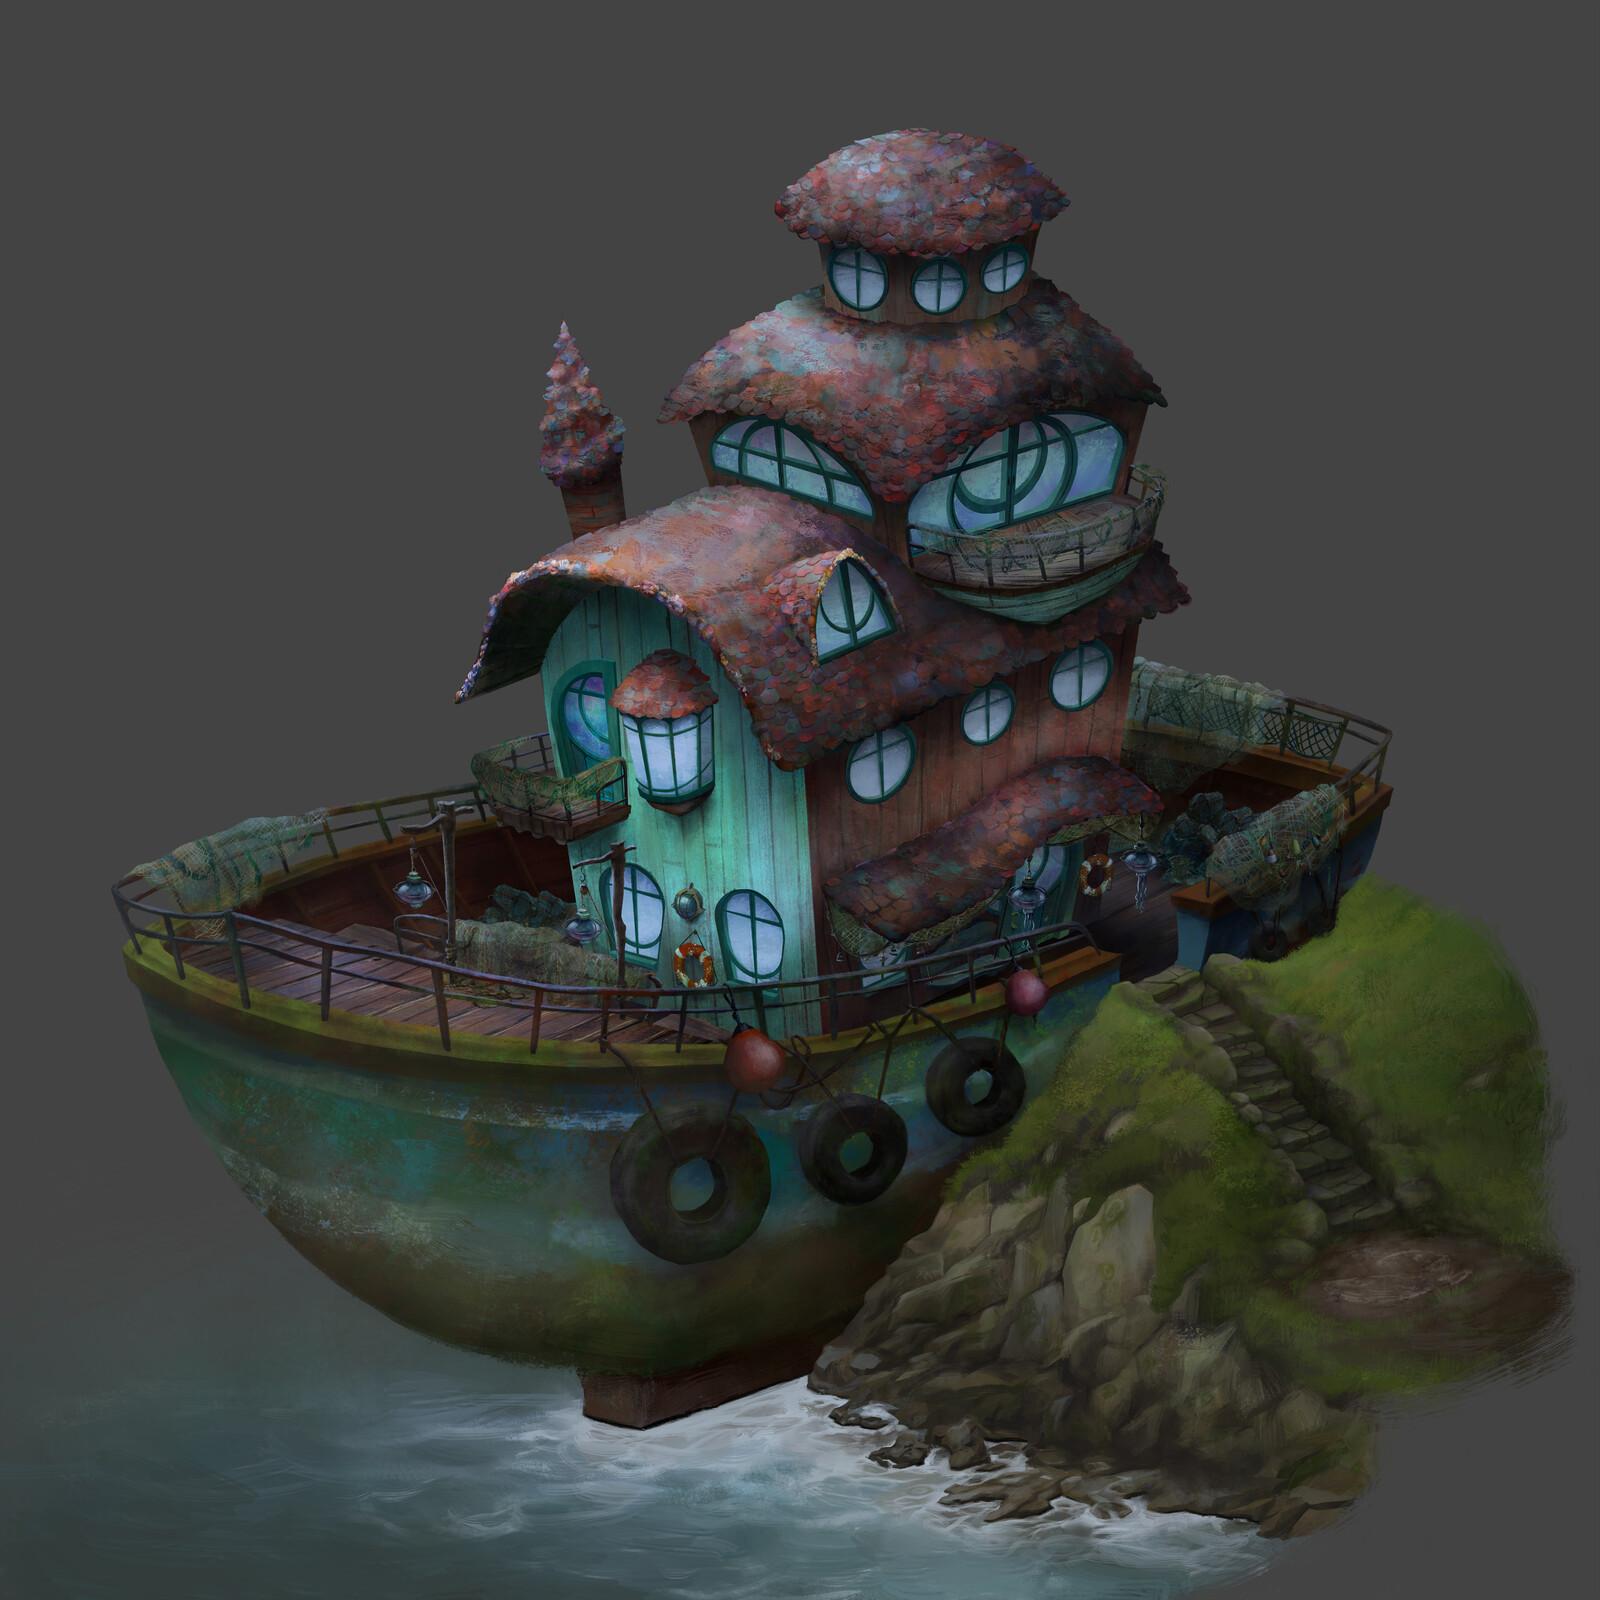 Set design: Eila's house